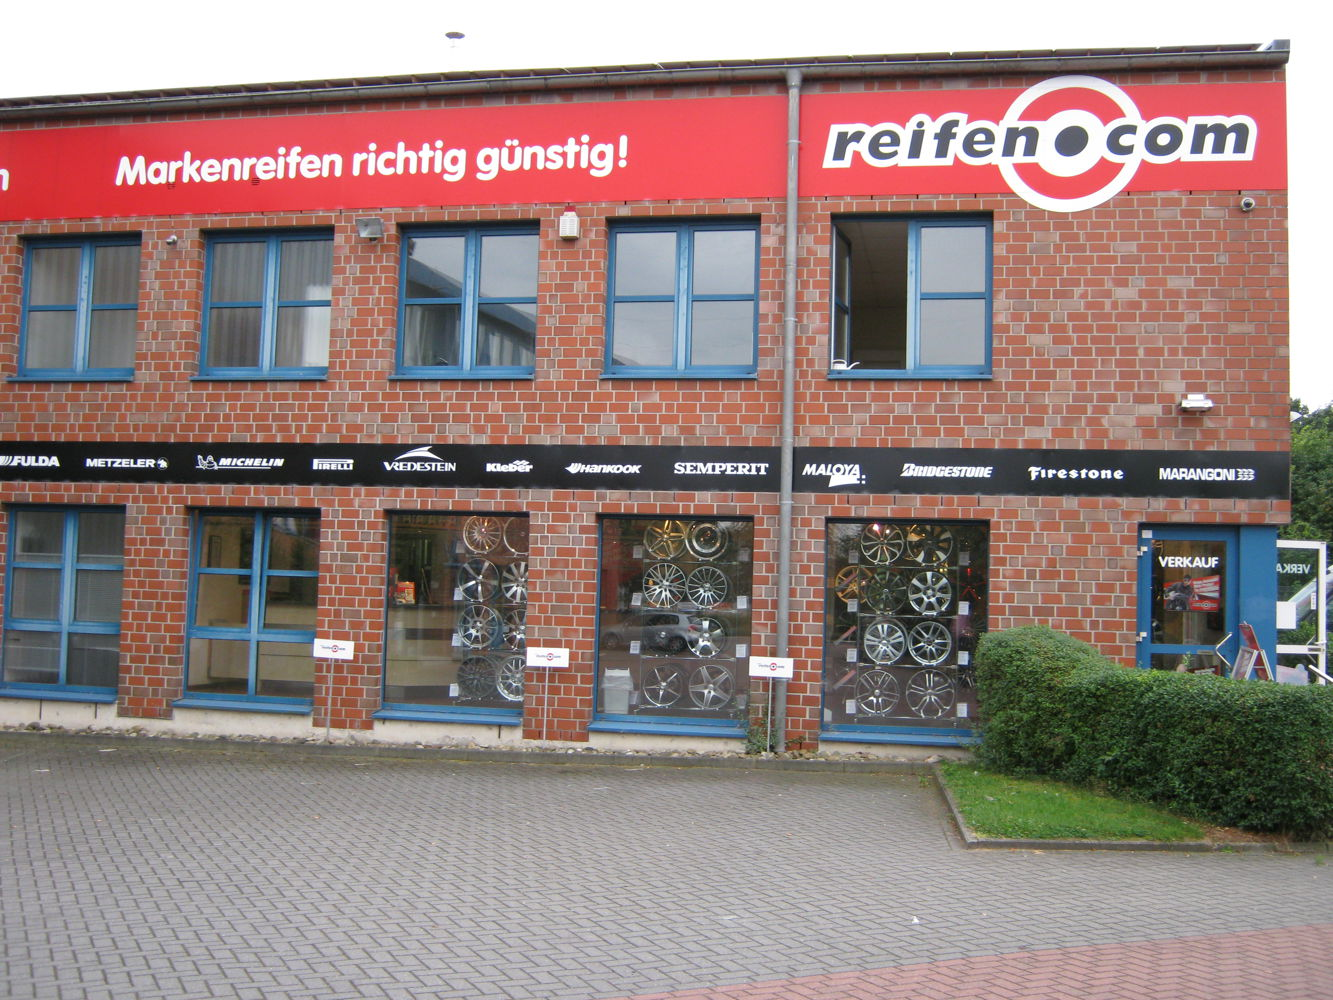 reifen.com-branch in Osnabrück